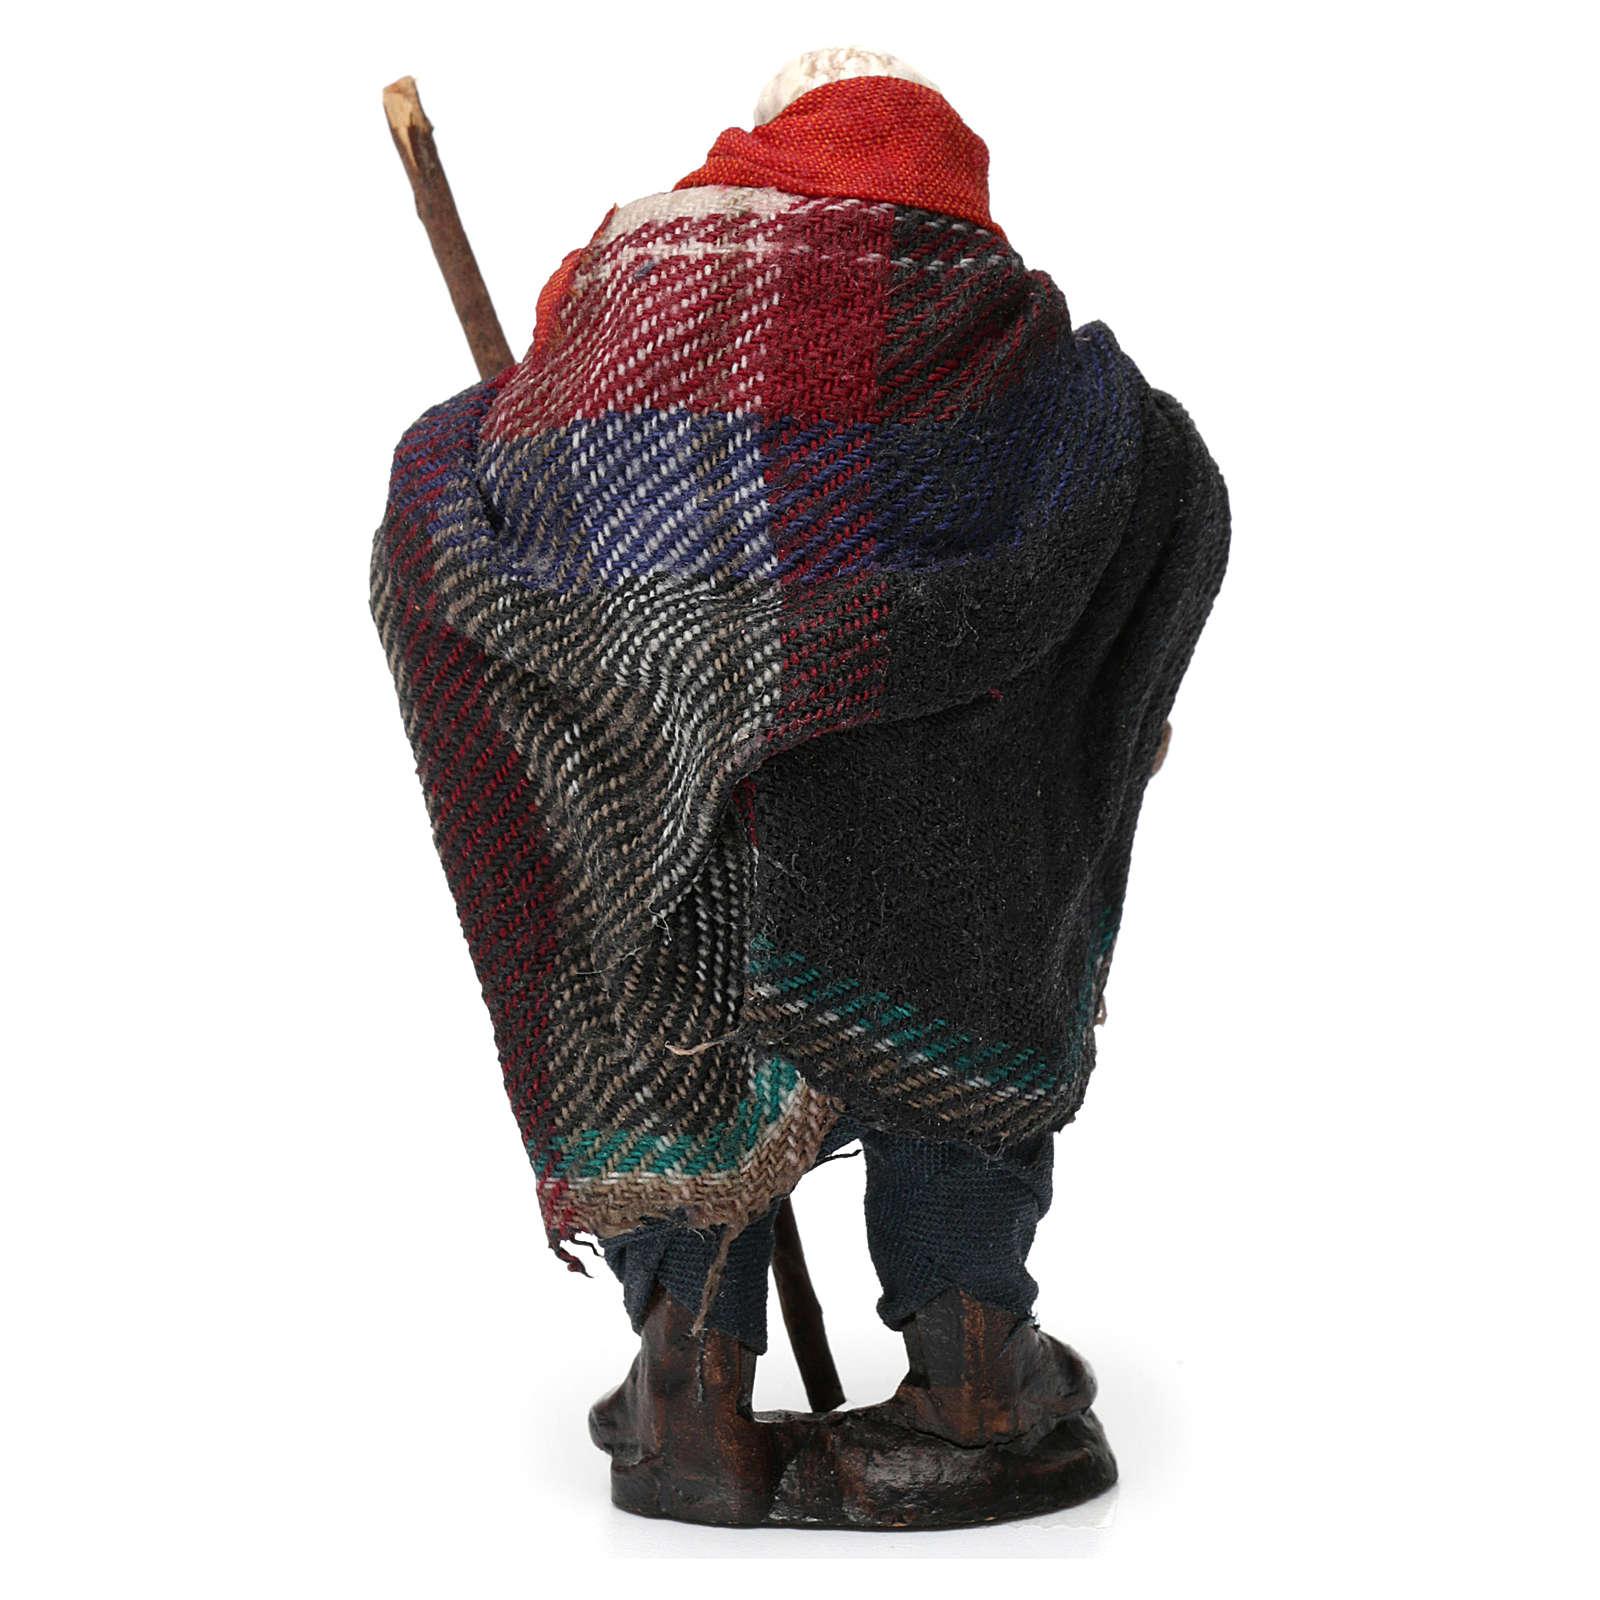 Hombre con cesta de fruta para belén napolitano 8 cm de altura media 4